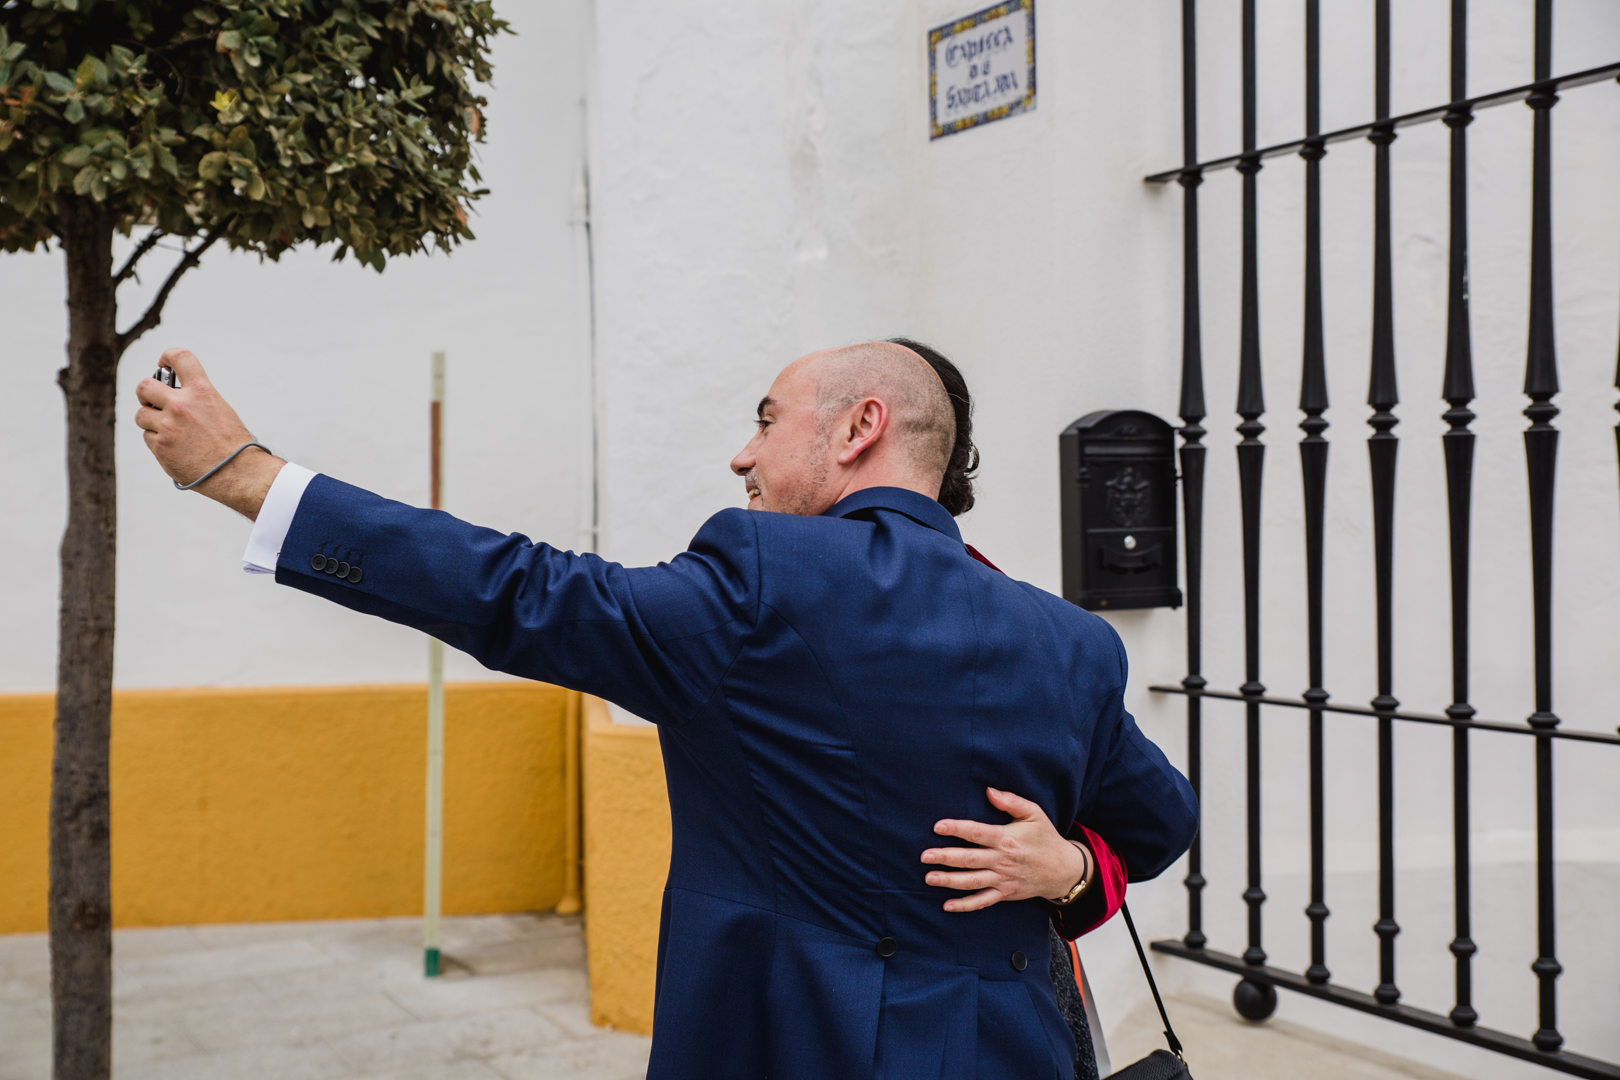 boda hacienda torre doña maria. carlos pavon fotografia. 600257783-29.jpg